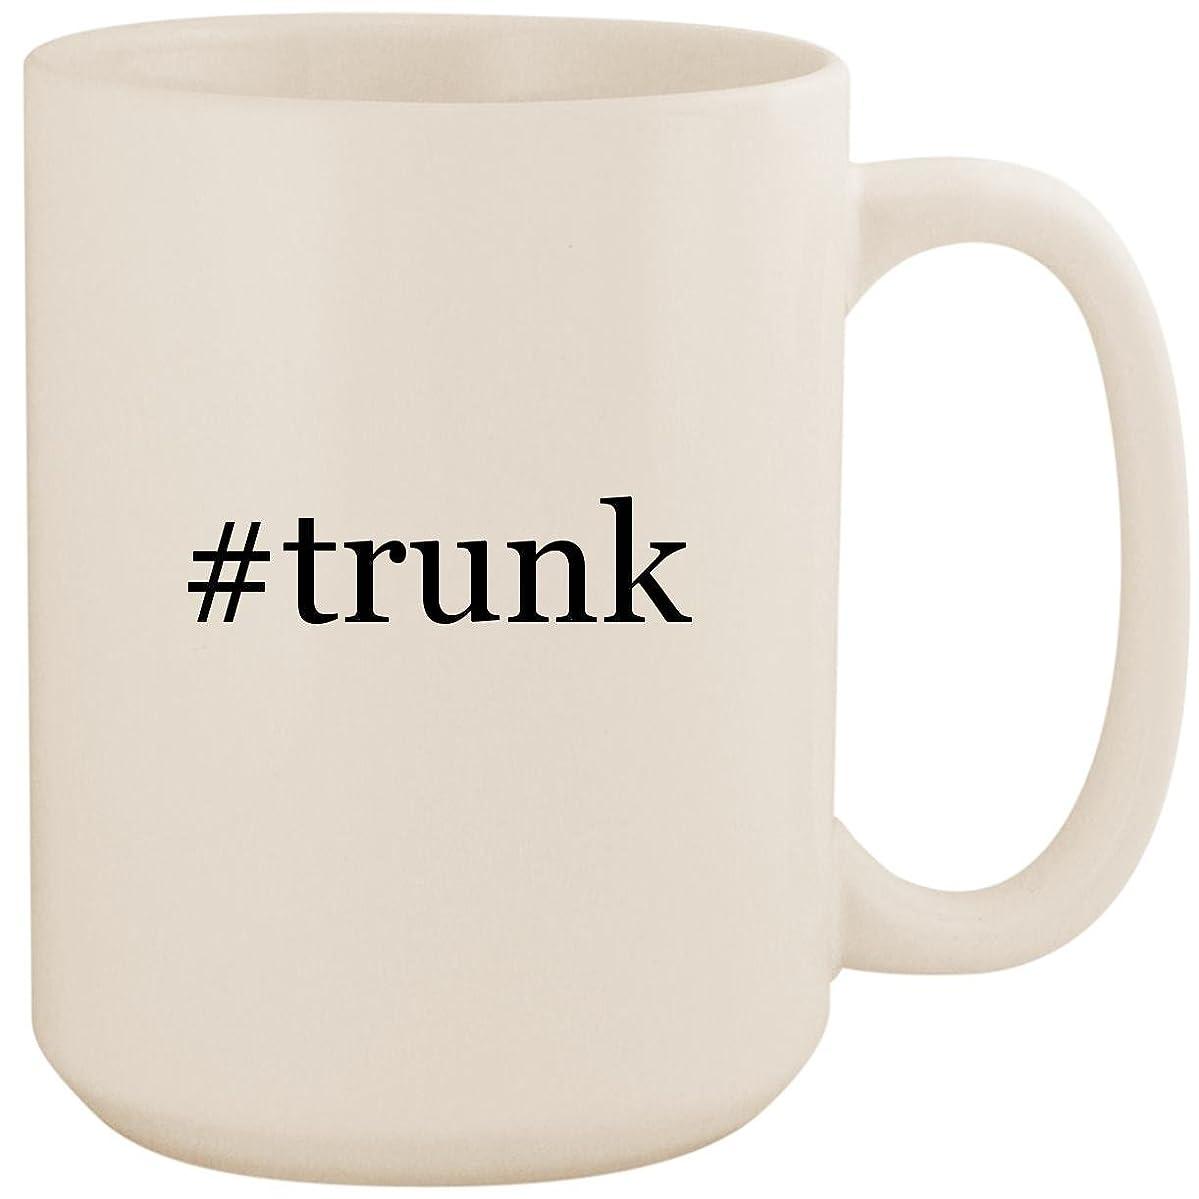 #trunk - White Hashtag 15oz Ceramic Coffee Mug Cup